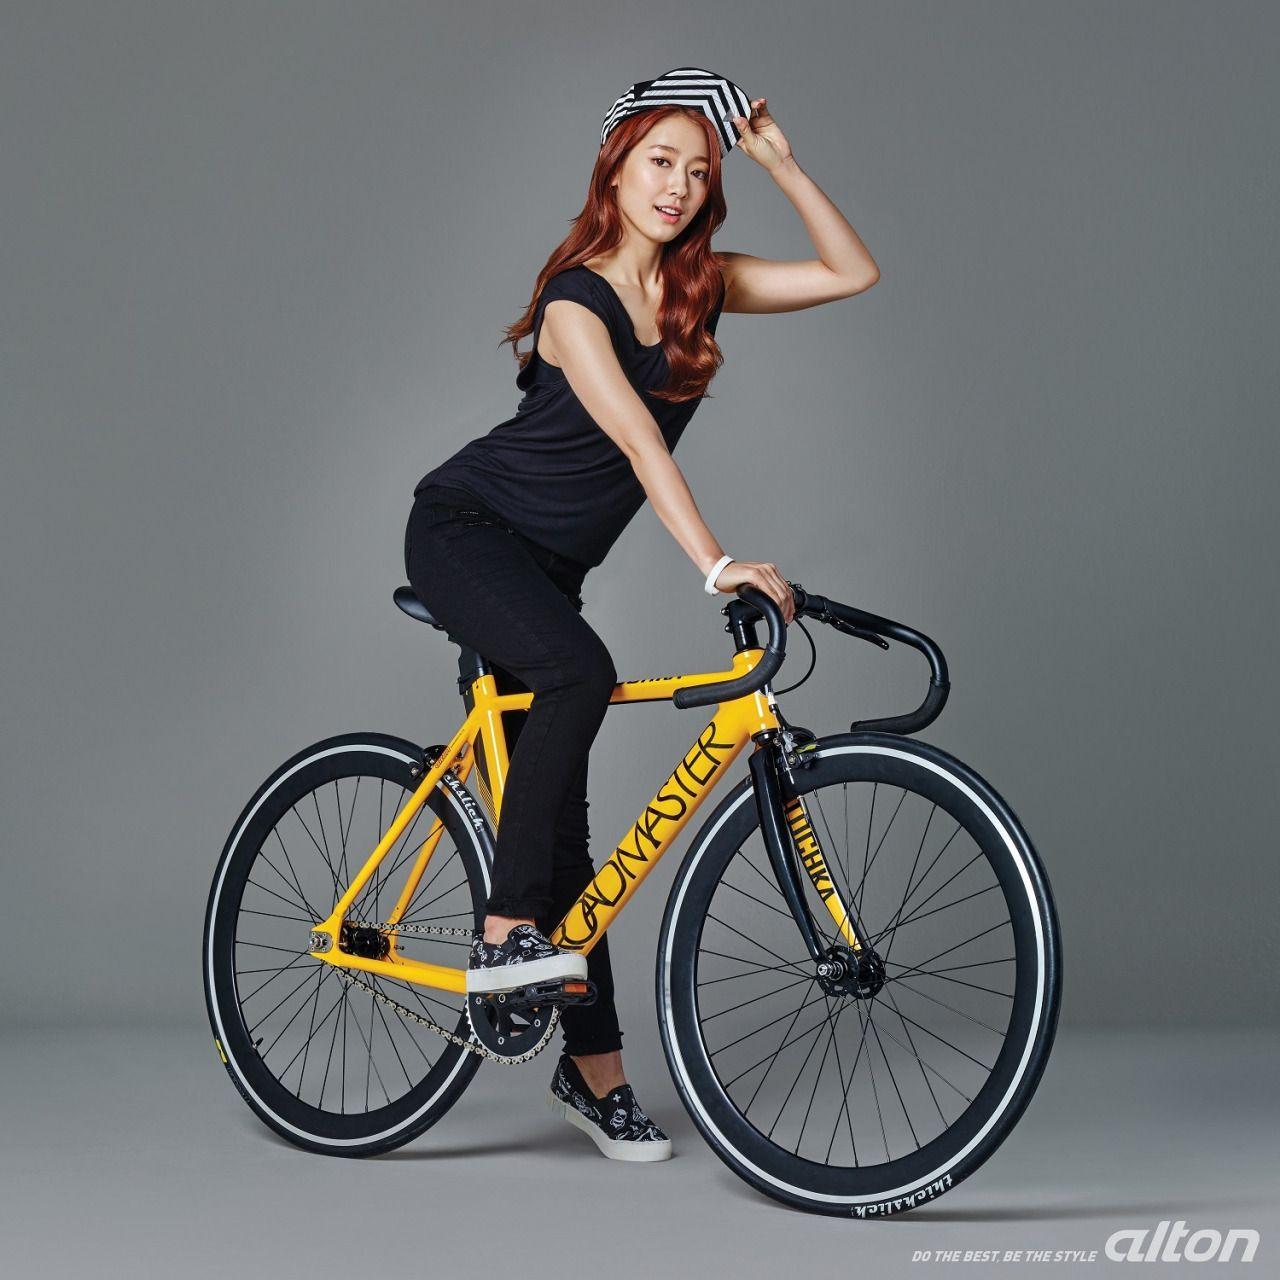 Park Shin Hye Park Shin Hye Bicycle Girl Bicycle Fashion Women